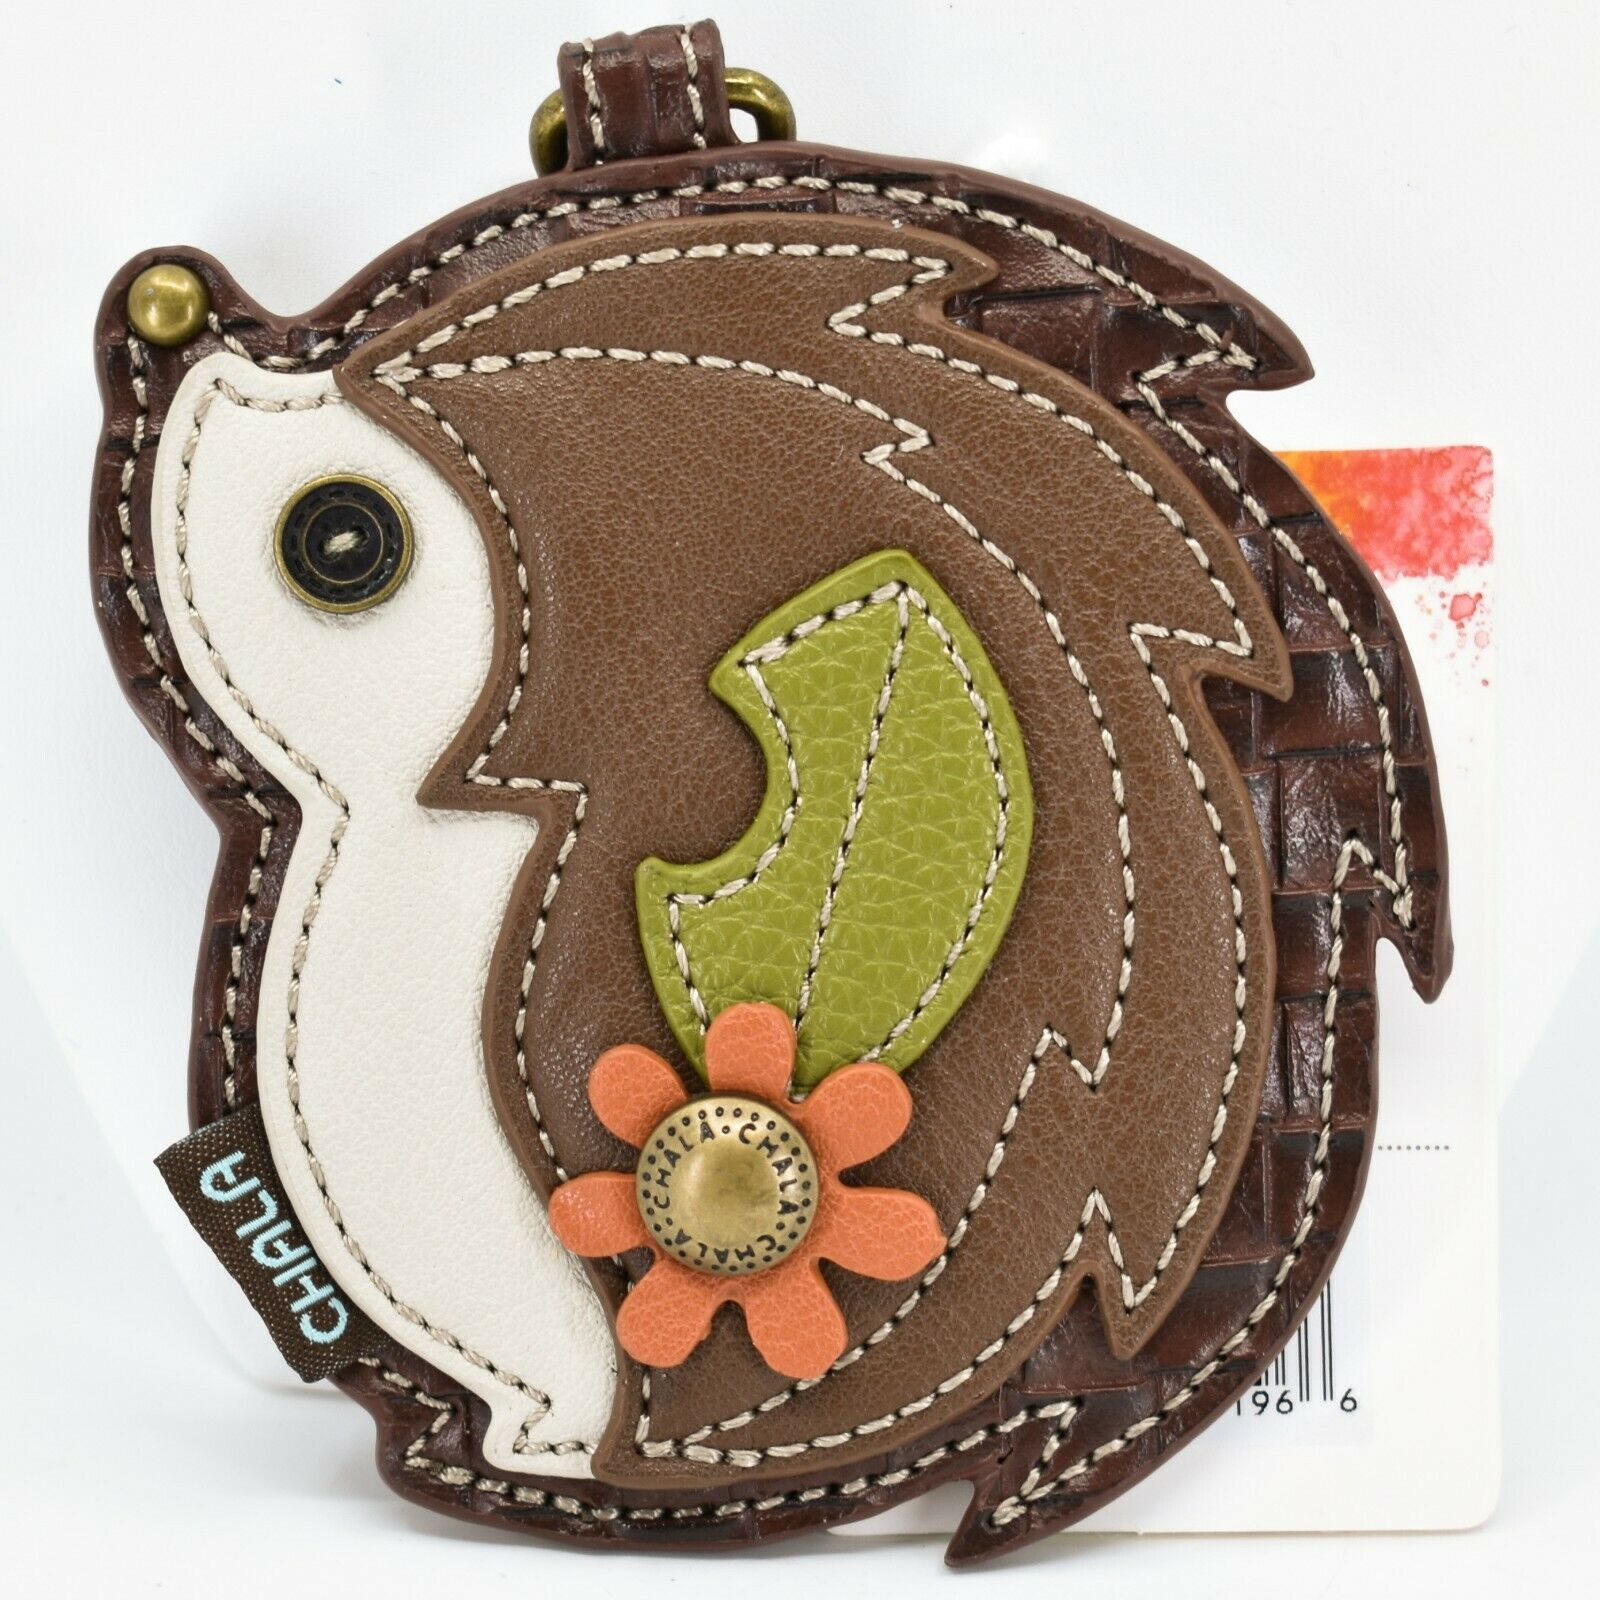 Chala Handbags Faux Leather Whimsical Hedgehog Coin Purse Key Chain Keychain